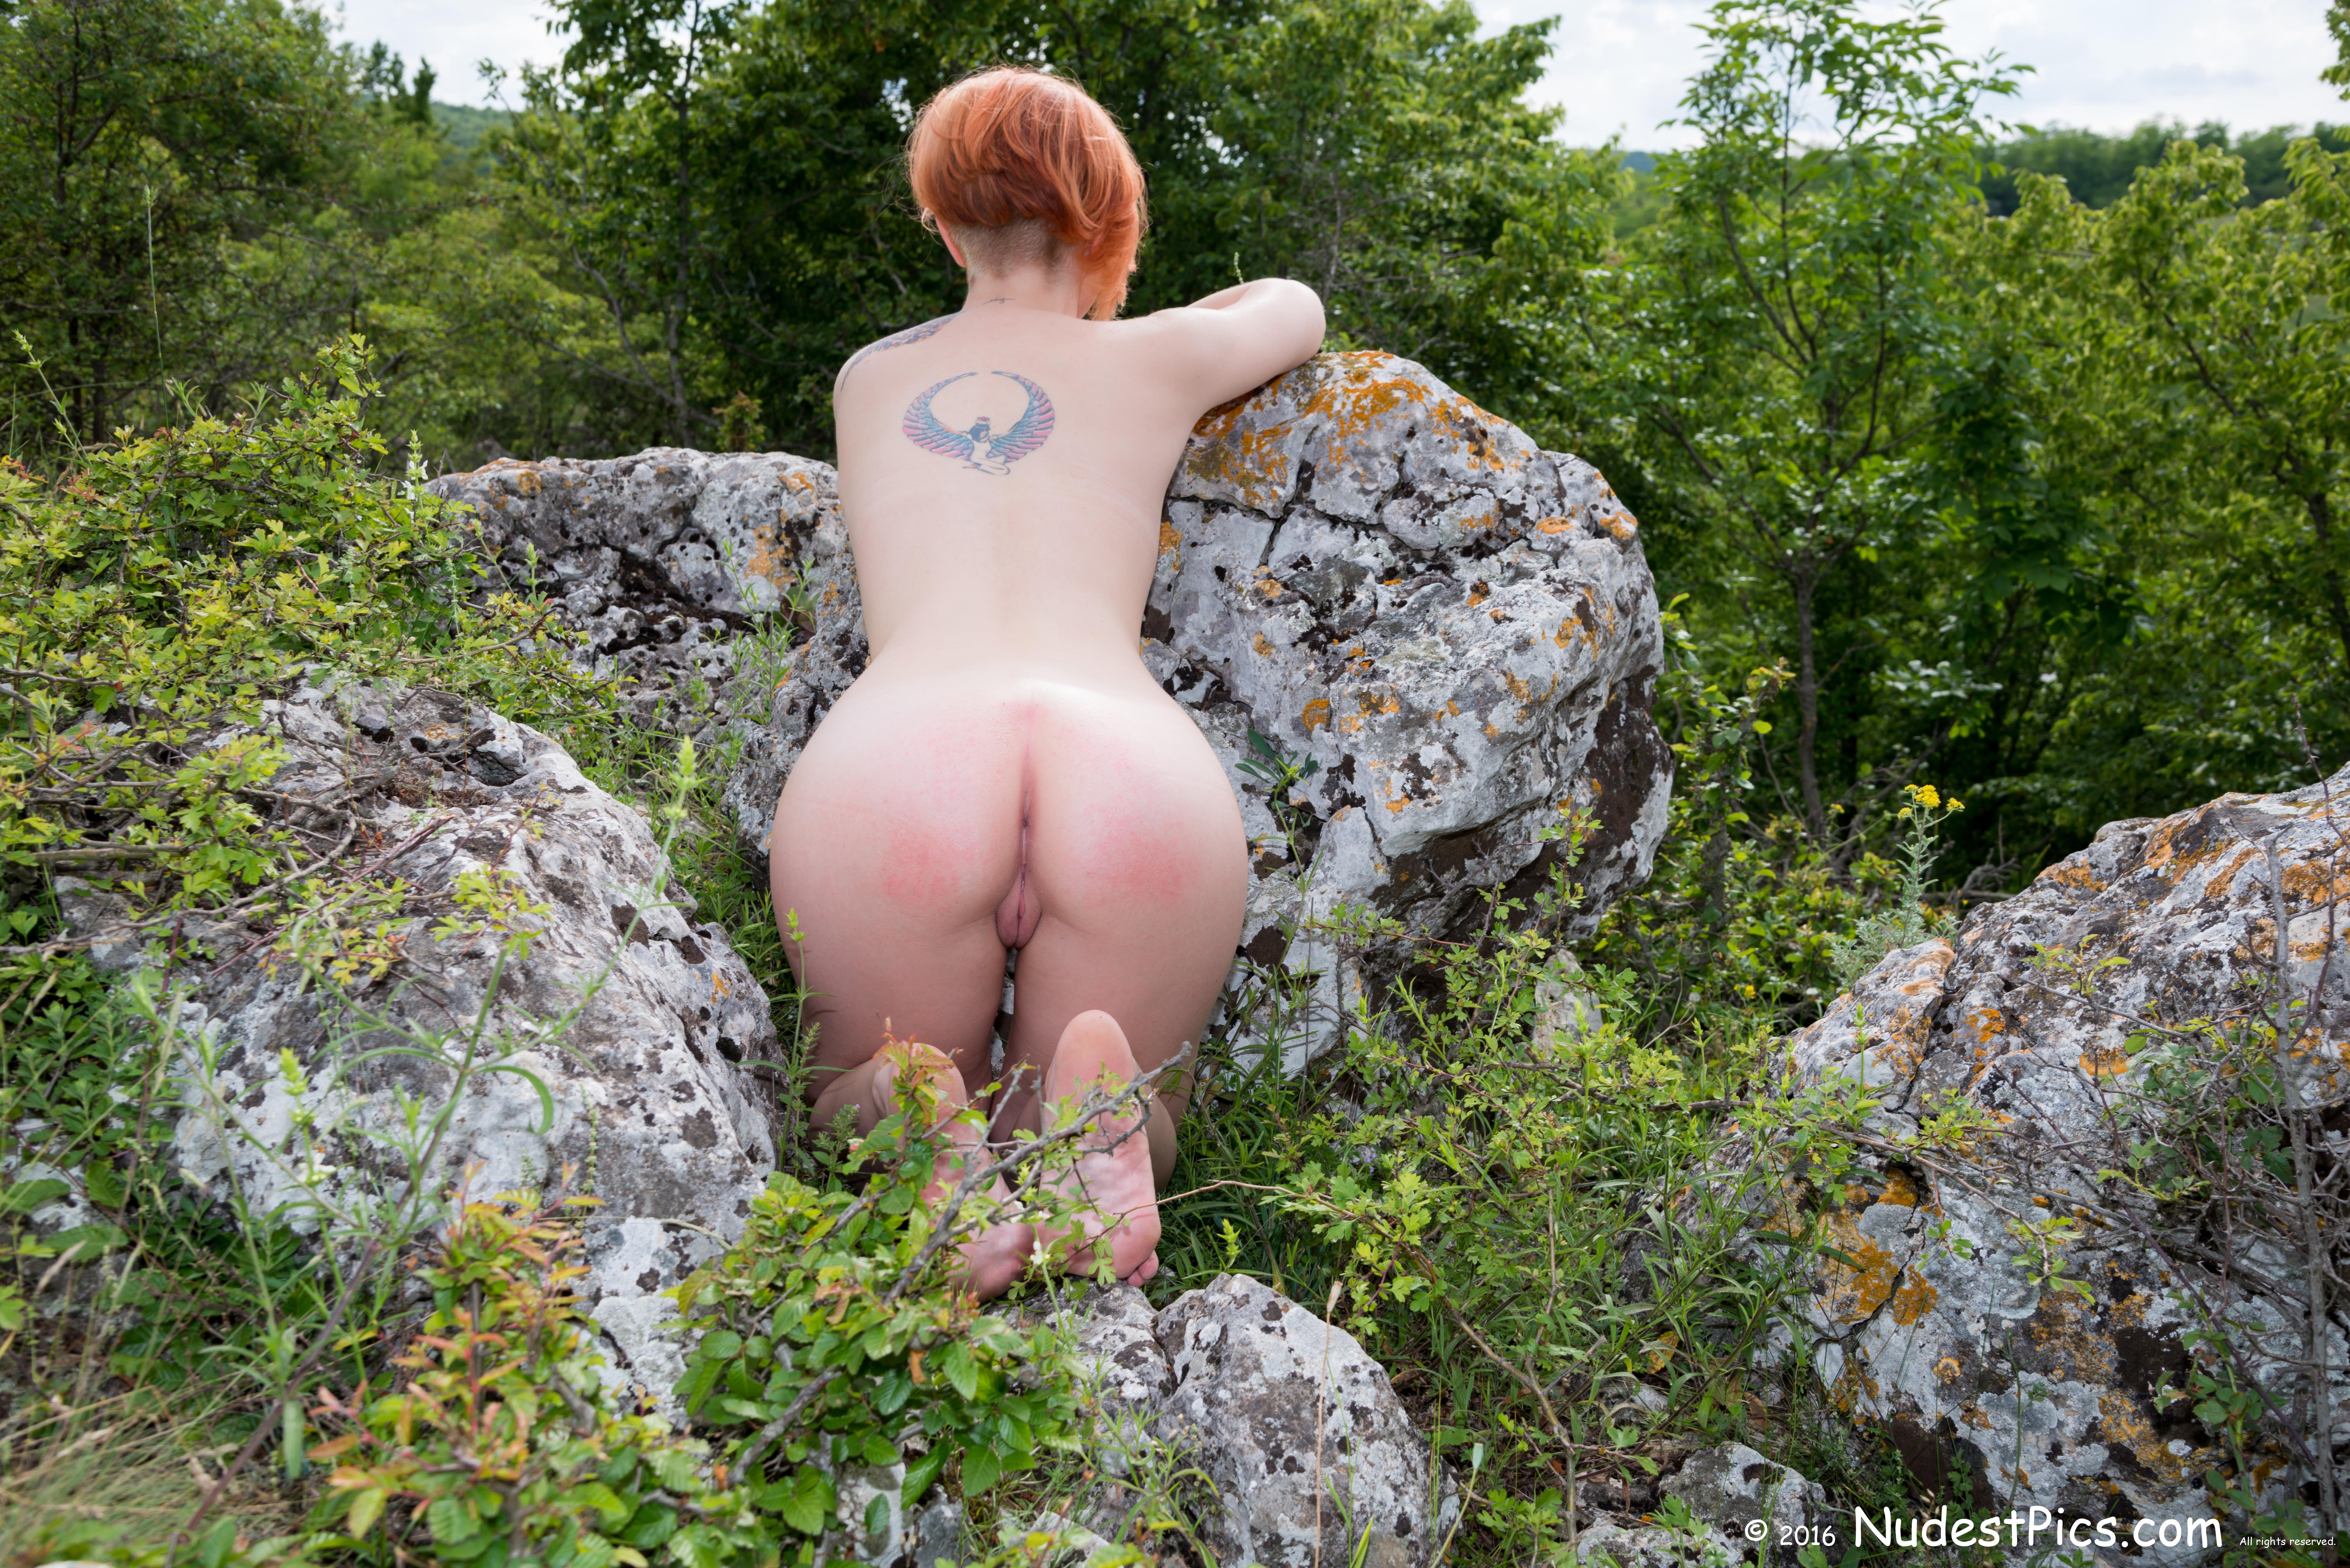 Naked Ginger Girl Kneeling at the Rocks HD